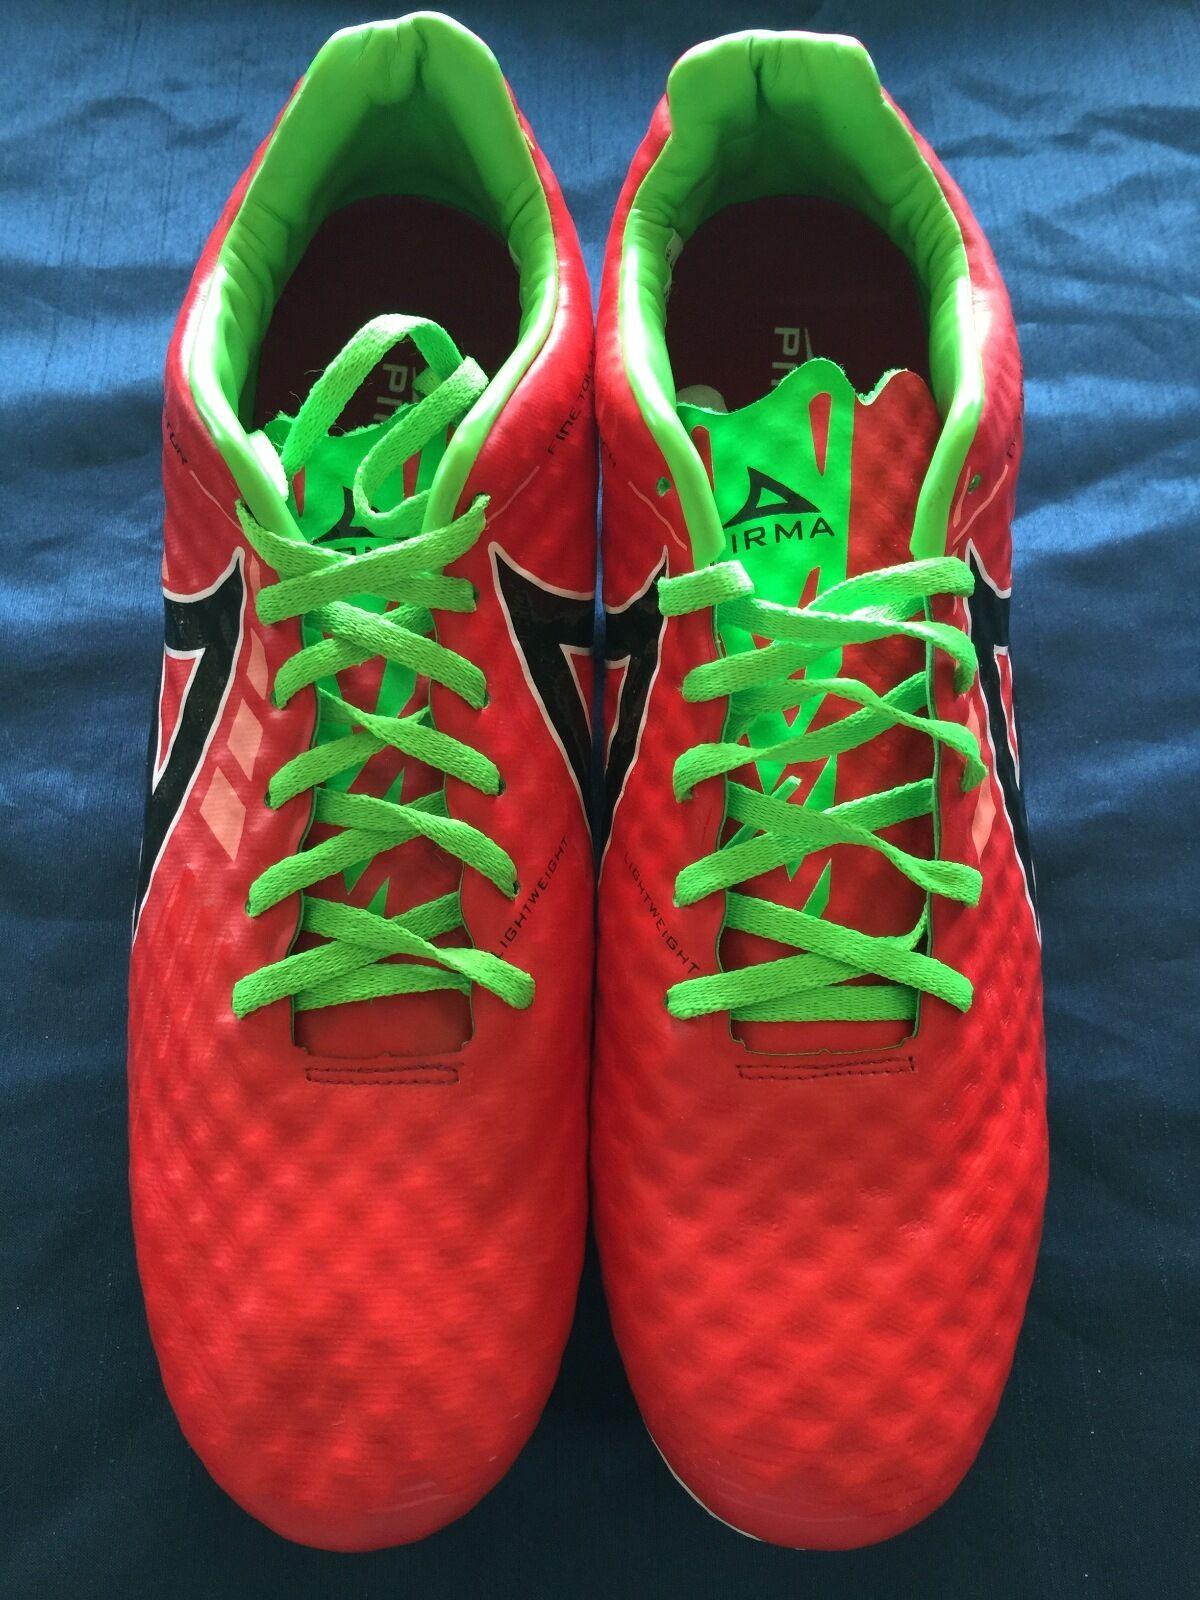 nuovo, PIRMA Detonator, cleats-Style 566-rosso, Futbol, Footbtutti.